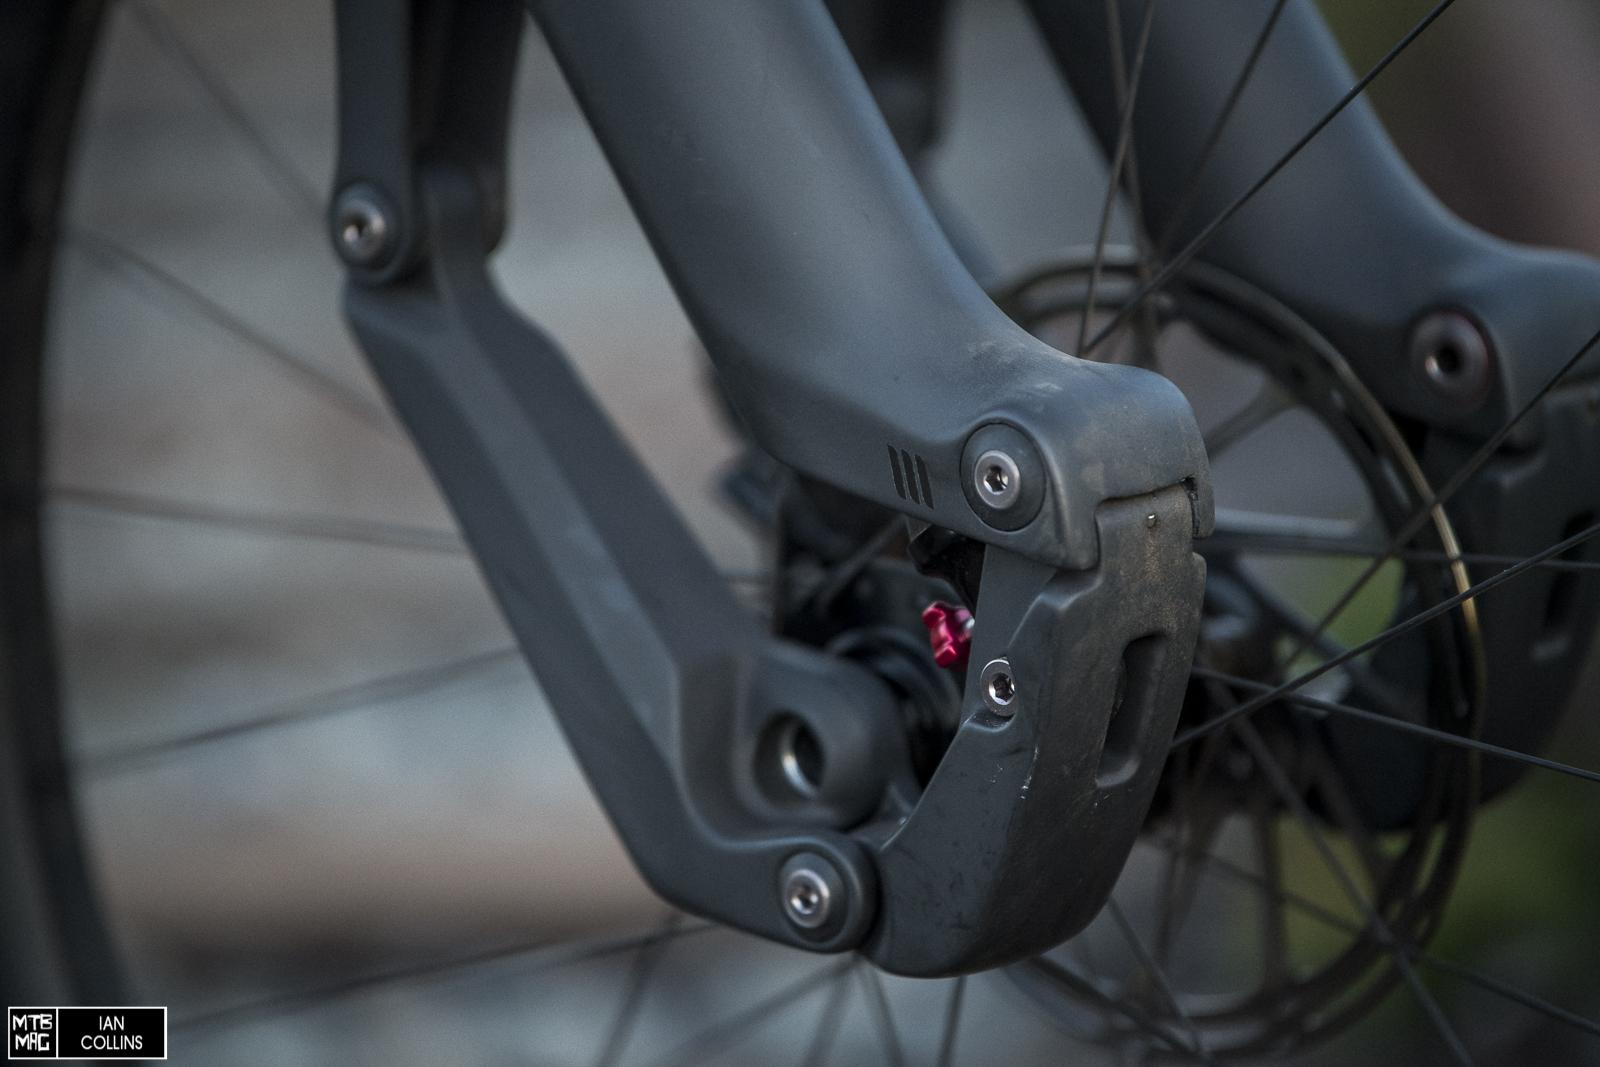 MTB-MAG COM - Mountain Bike Magazine | [Tested] Trust Performance